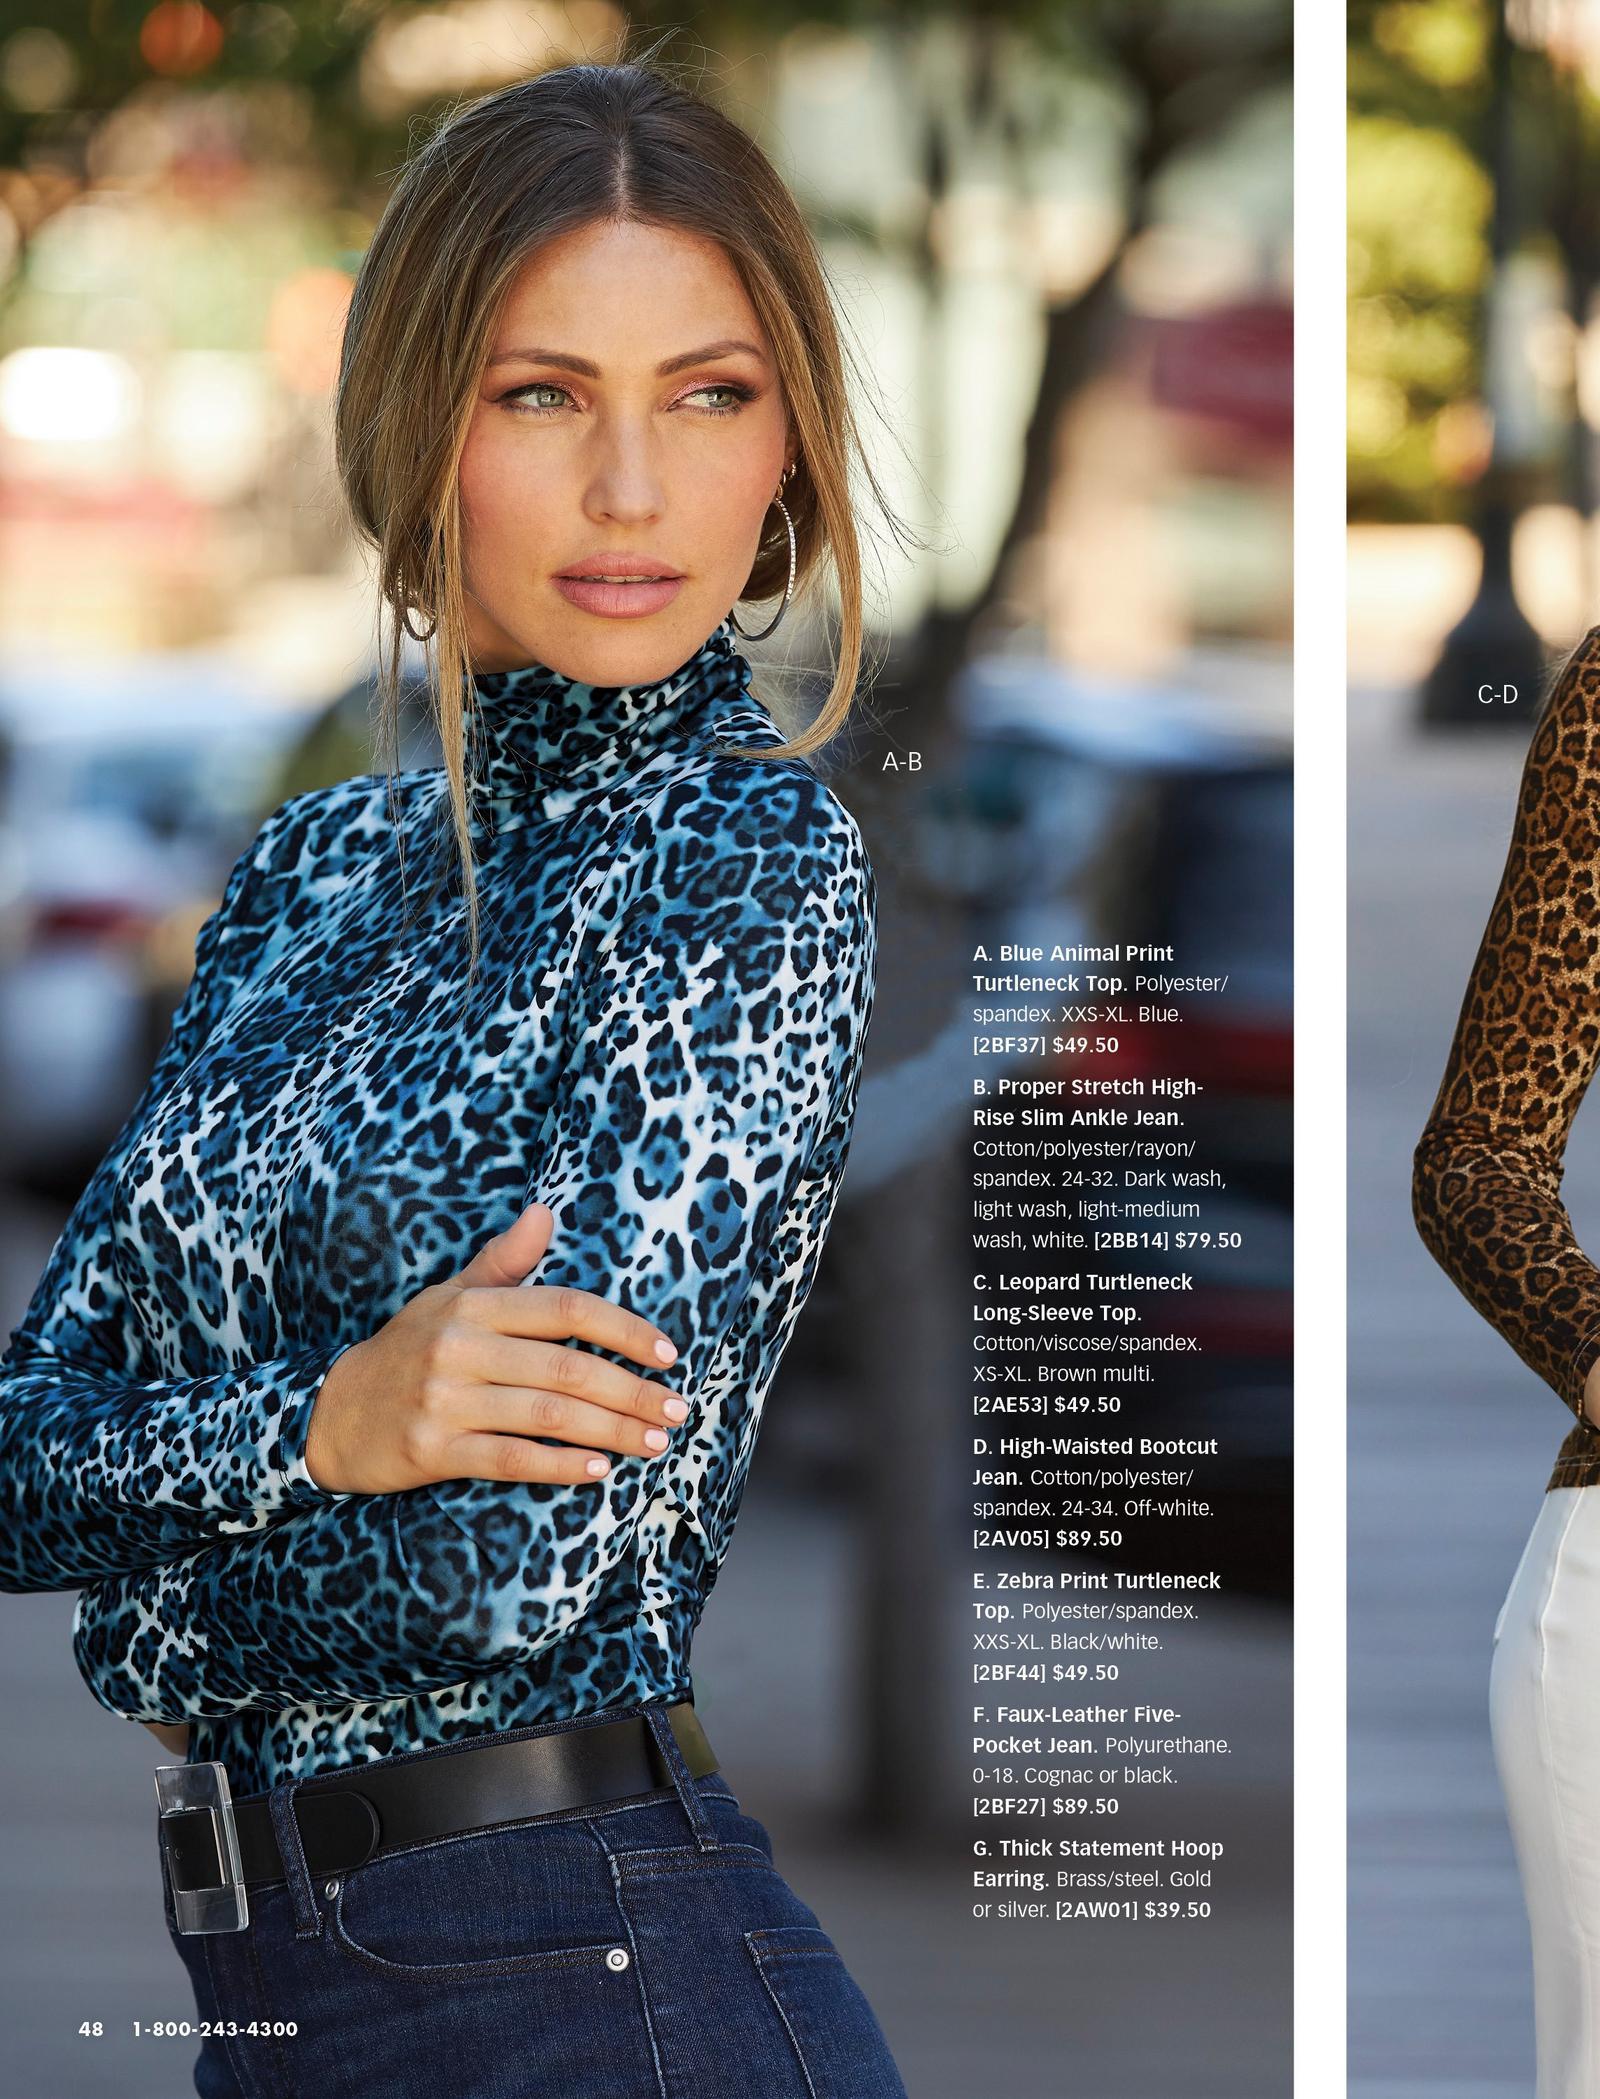 model wearing a blue animal print turtleneck long-sleeve top, black belt, and jeans.